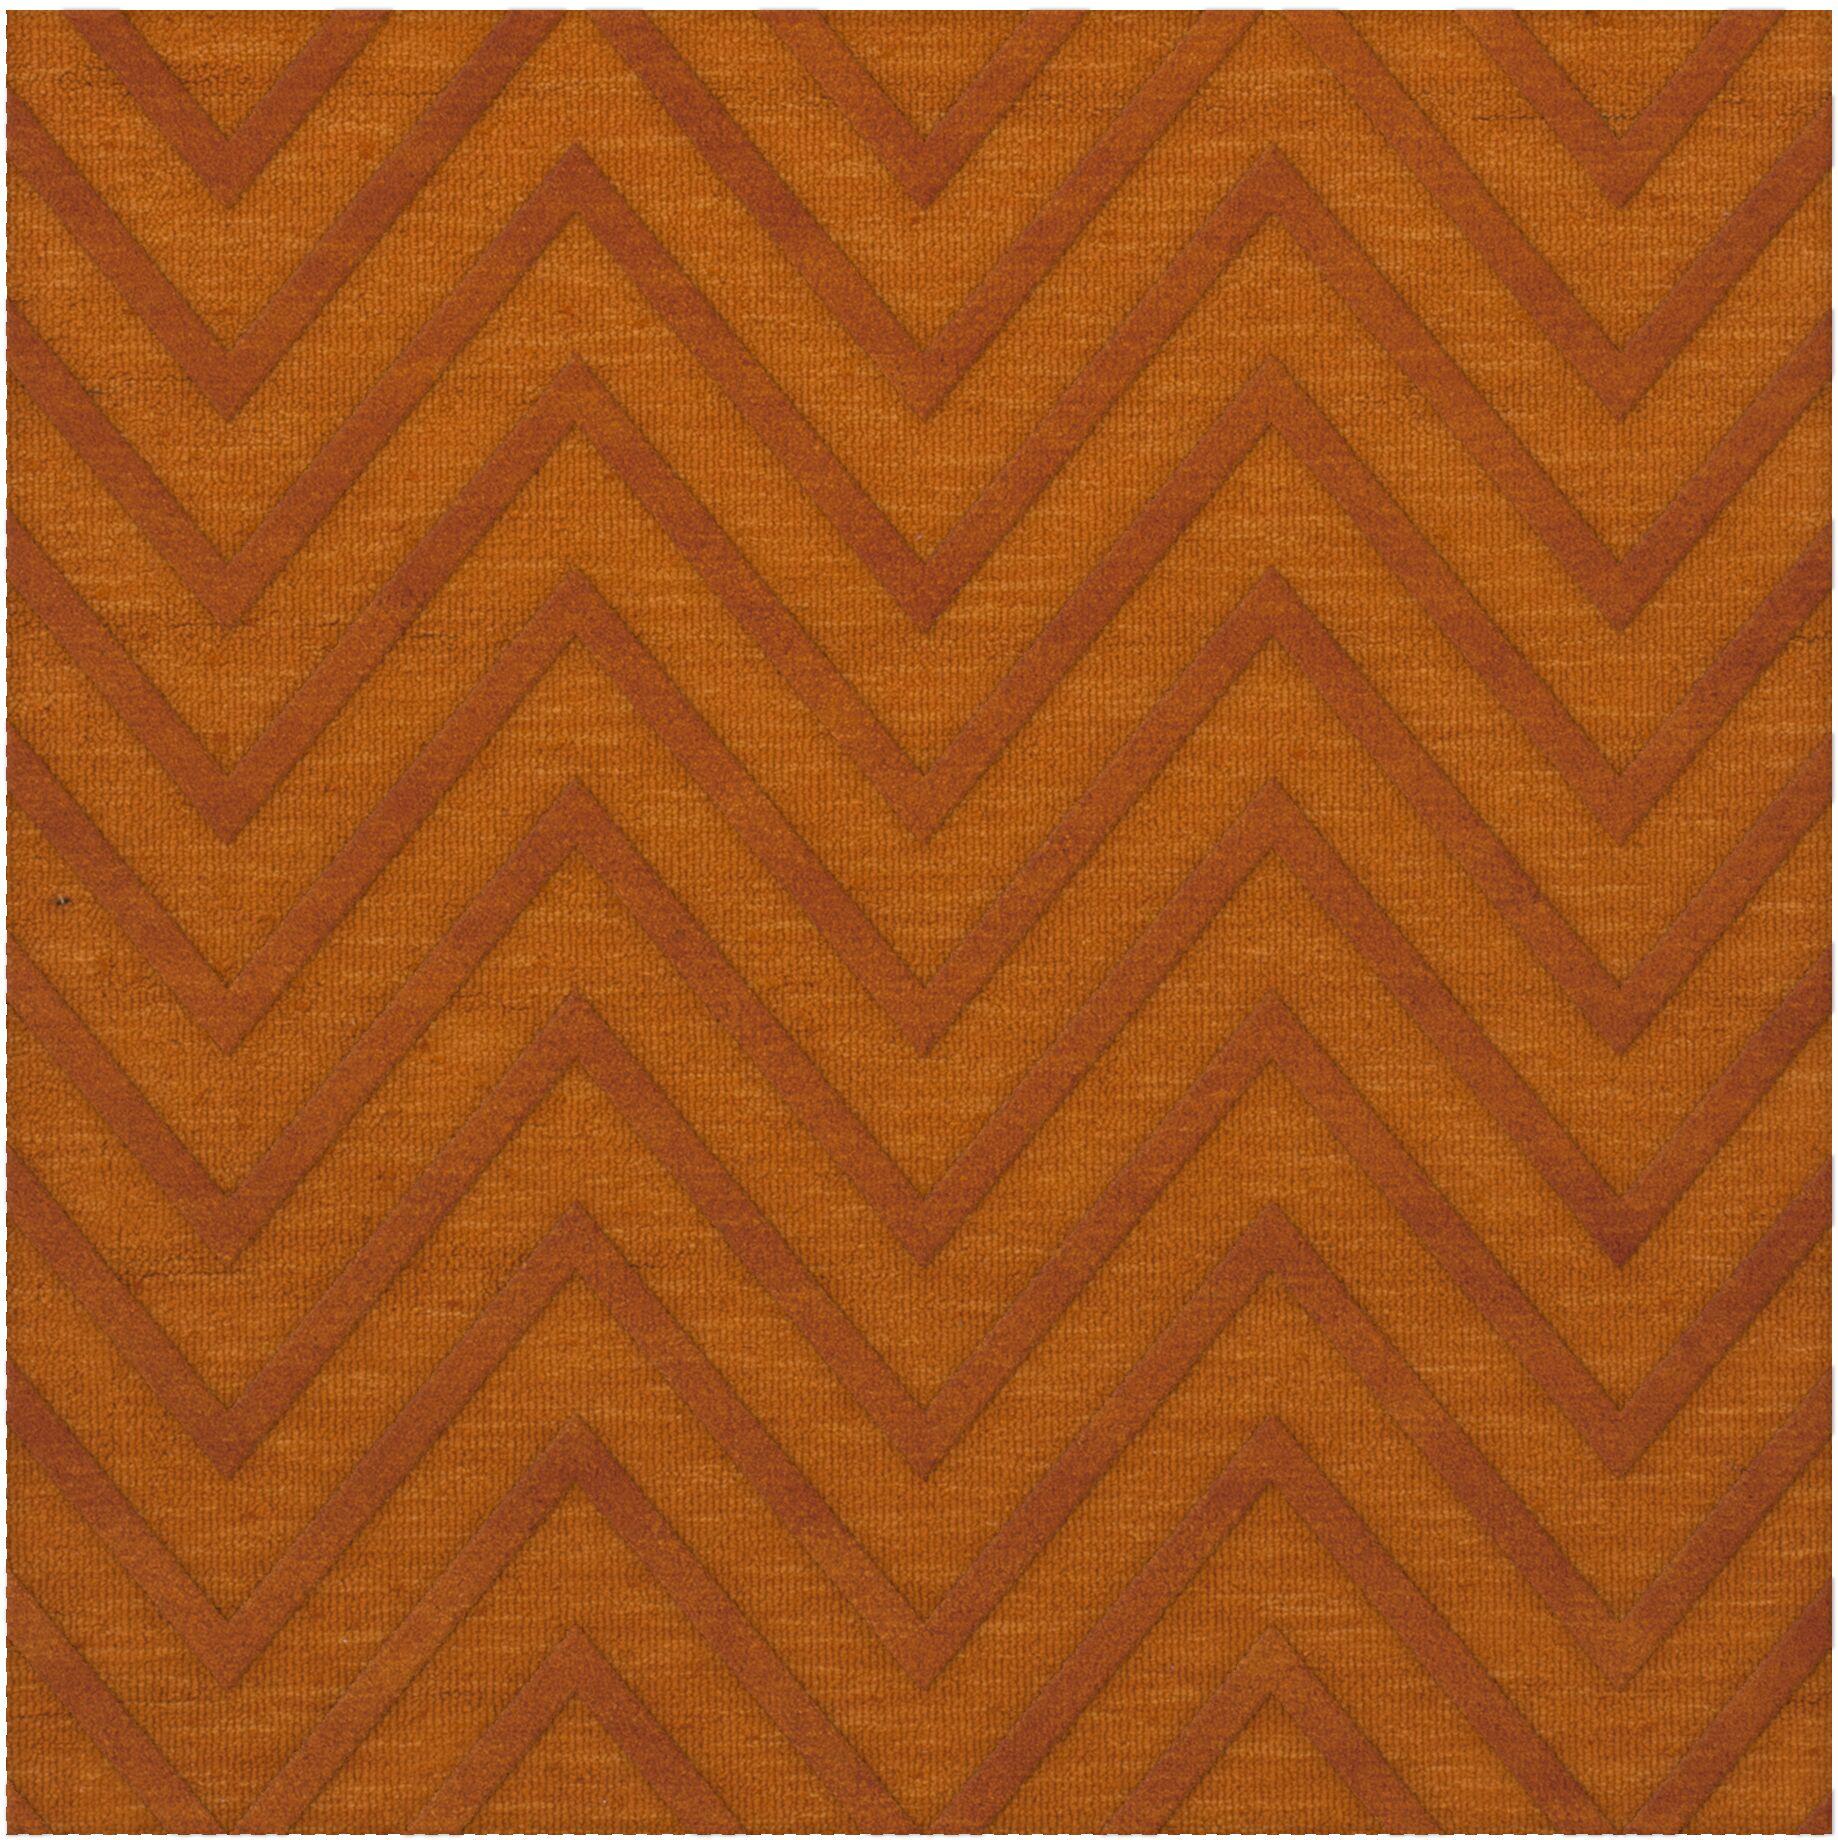 Dover Tufted Wool Orange Area Rug Rug Size: Square 4'